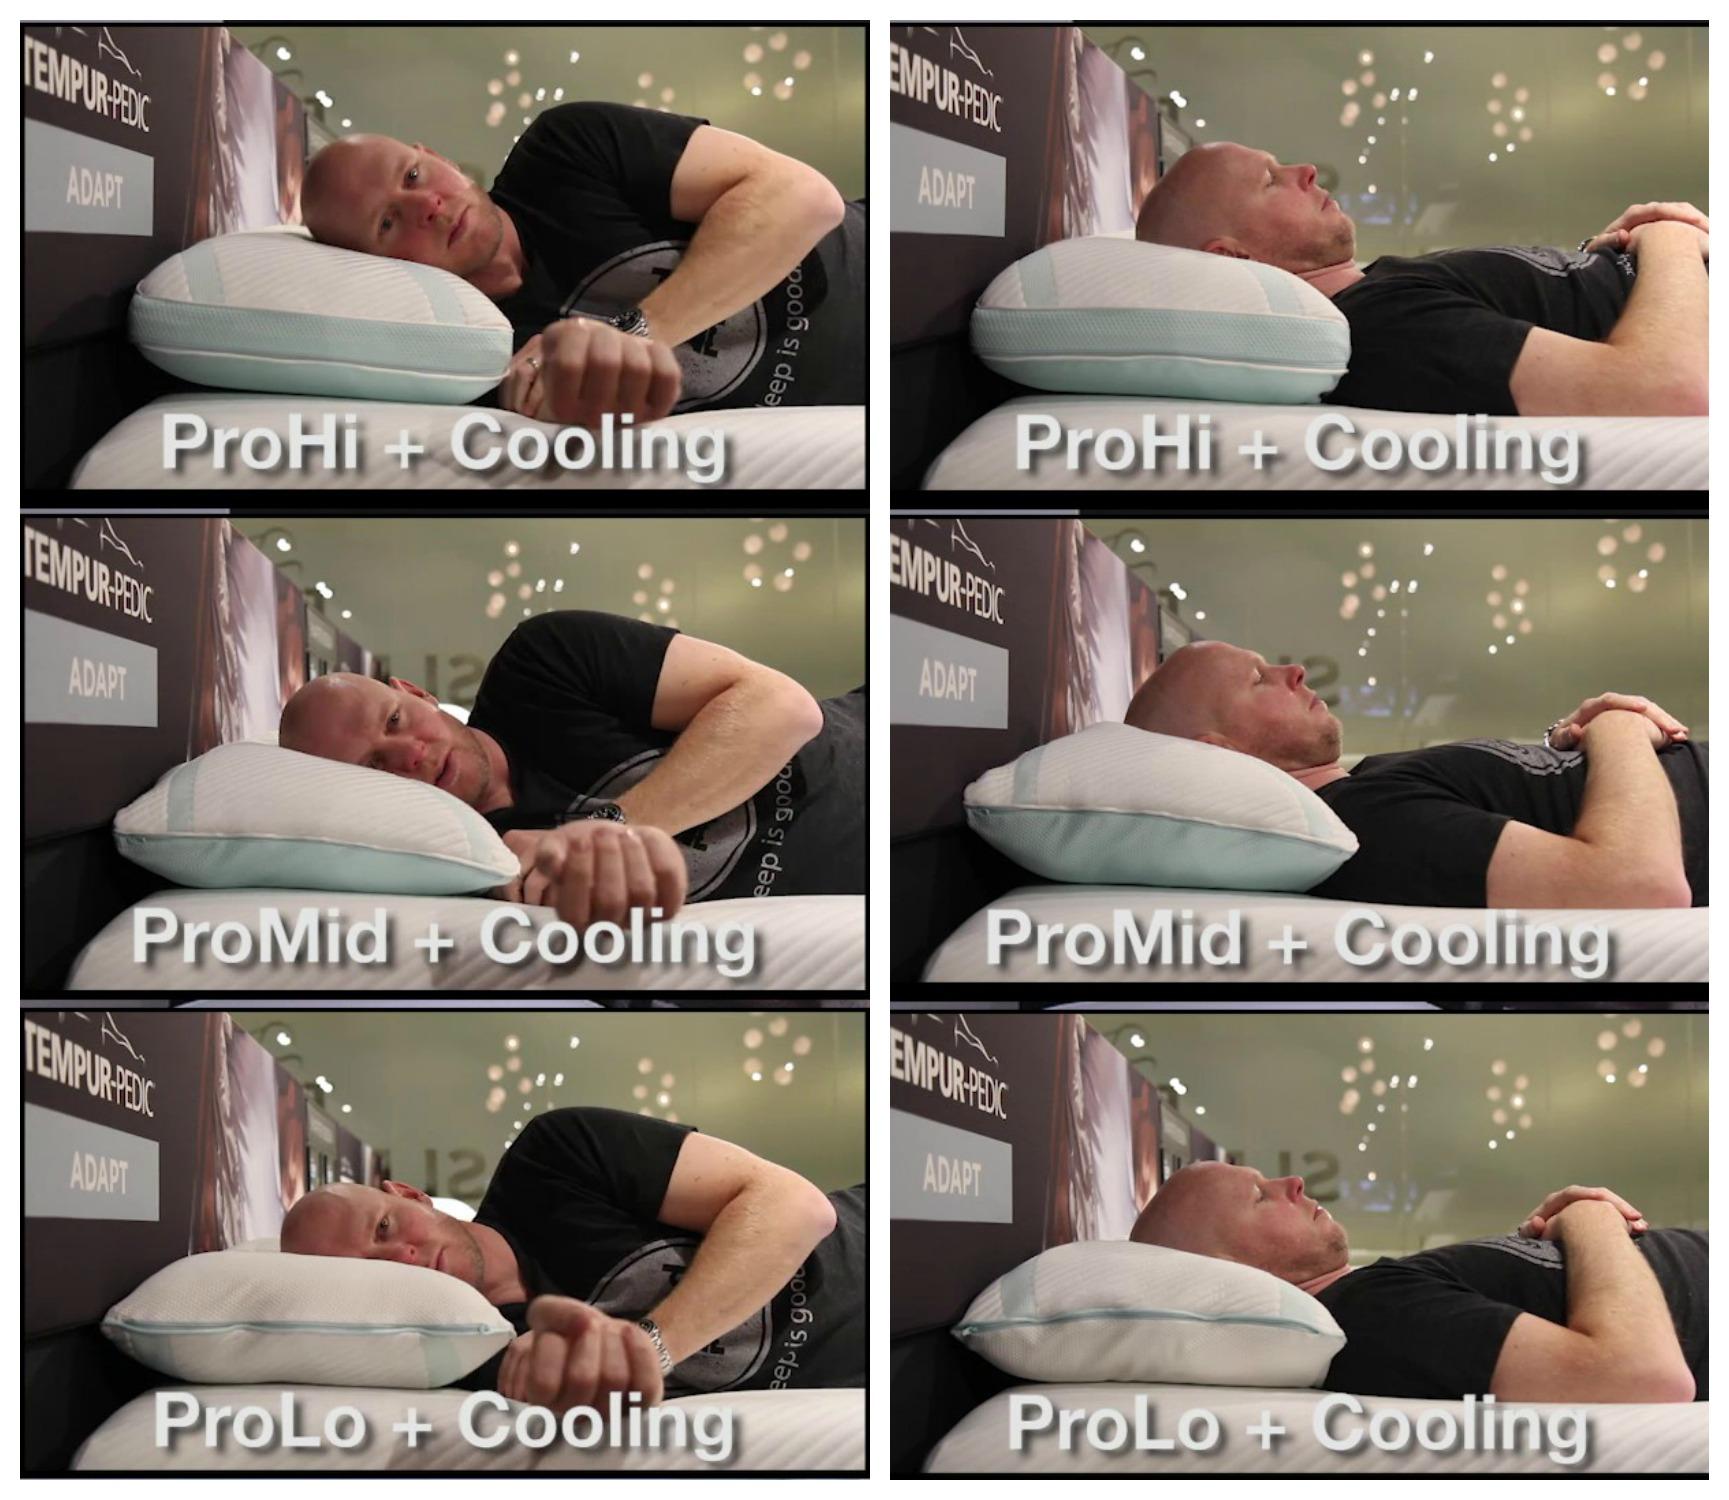 Tempur-Adapt Pro Pillows Comparison